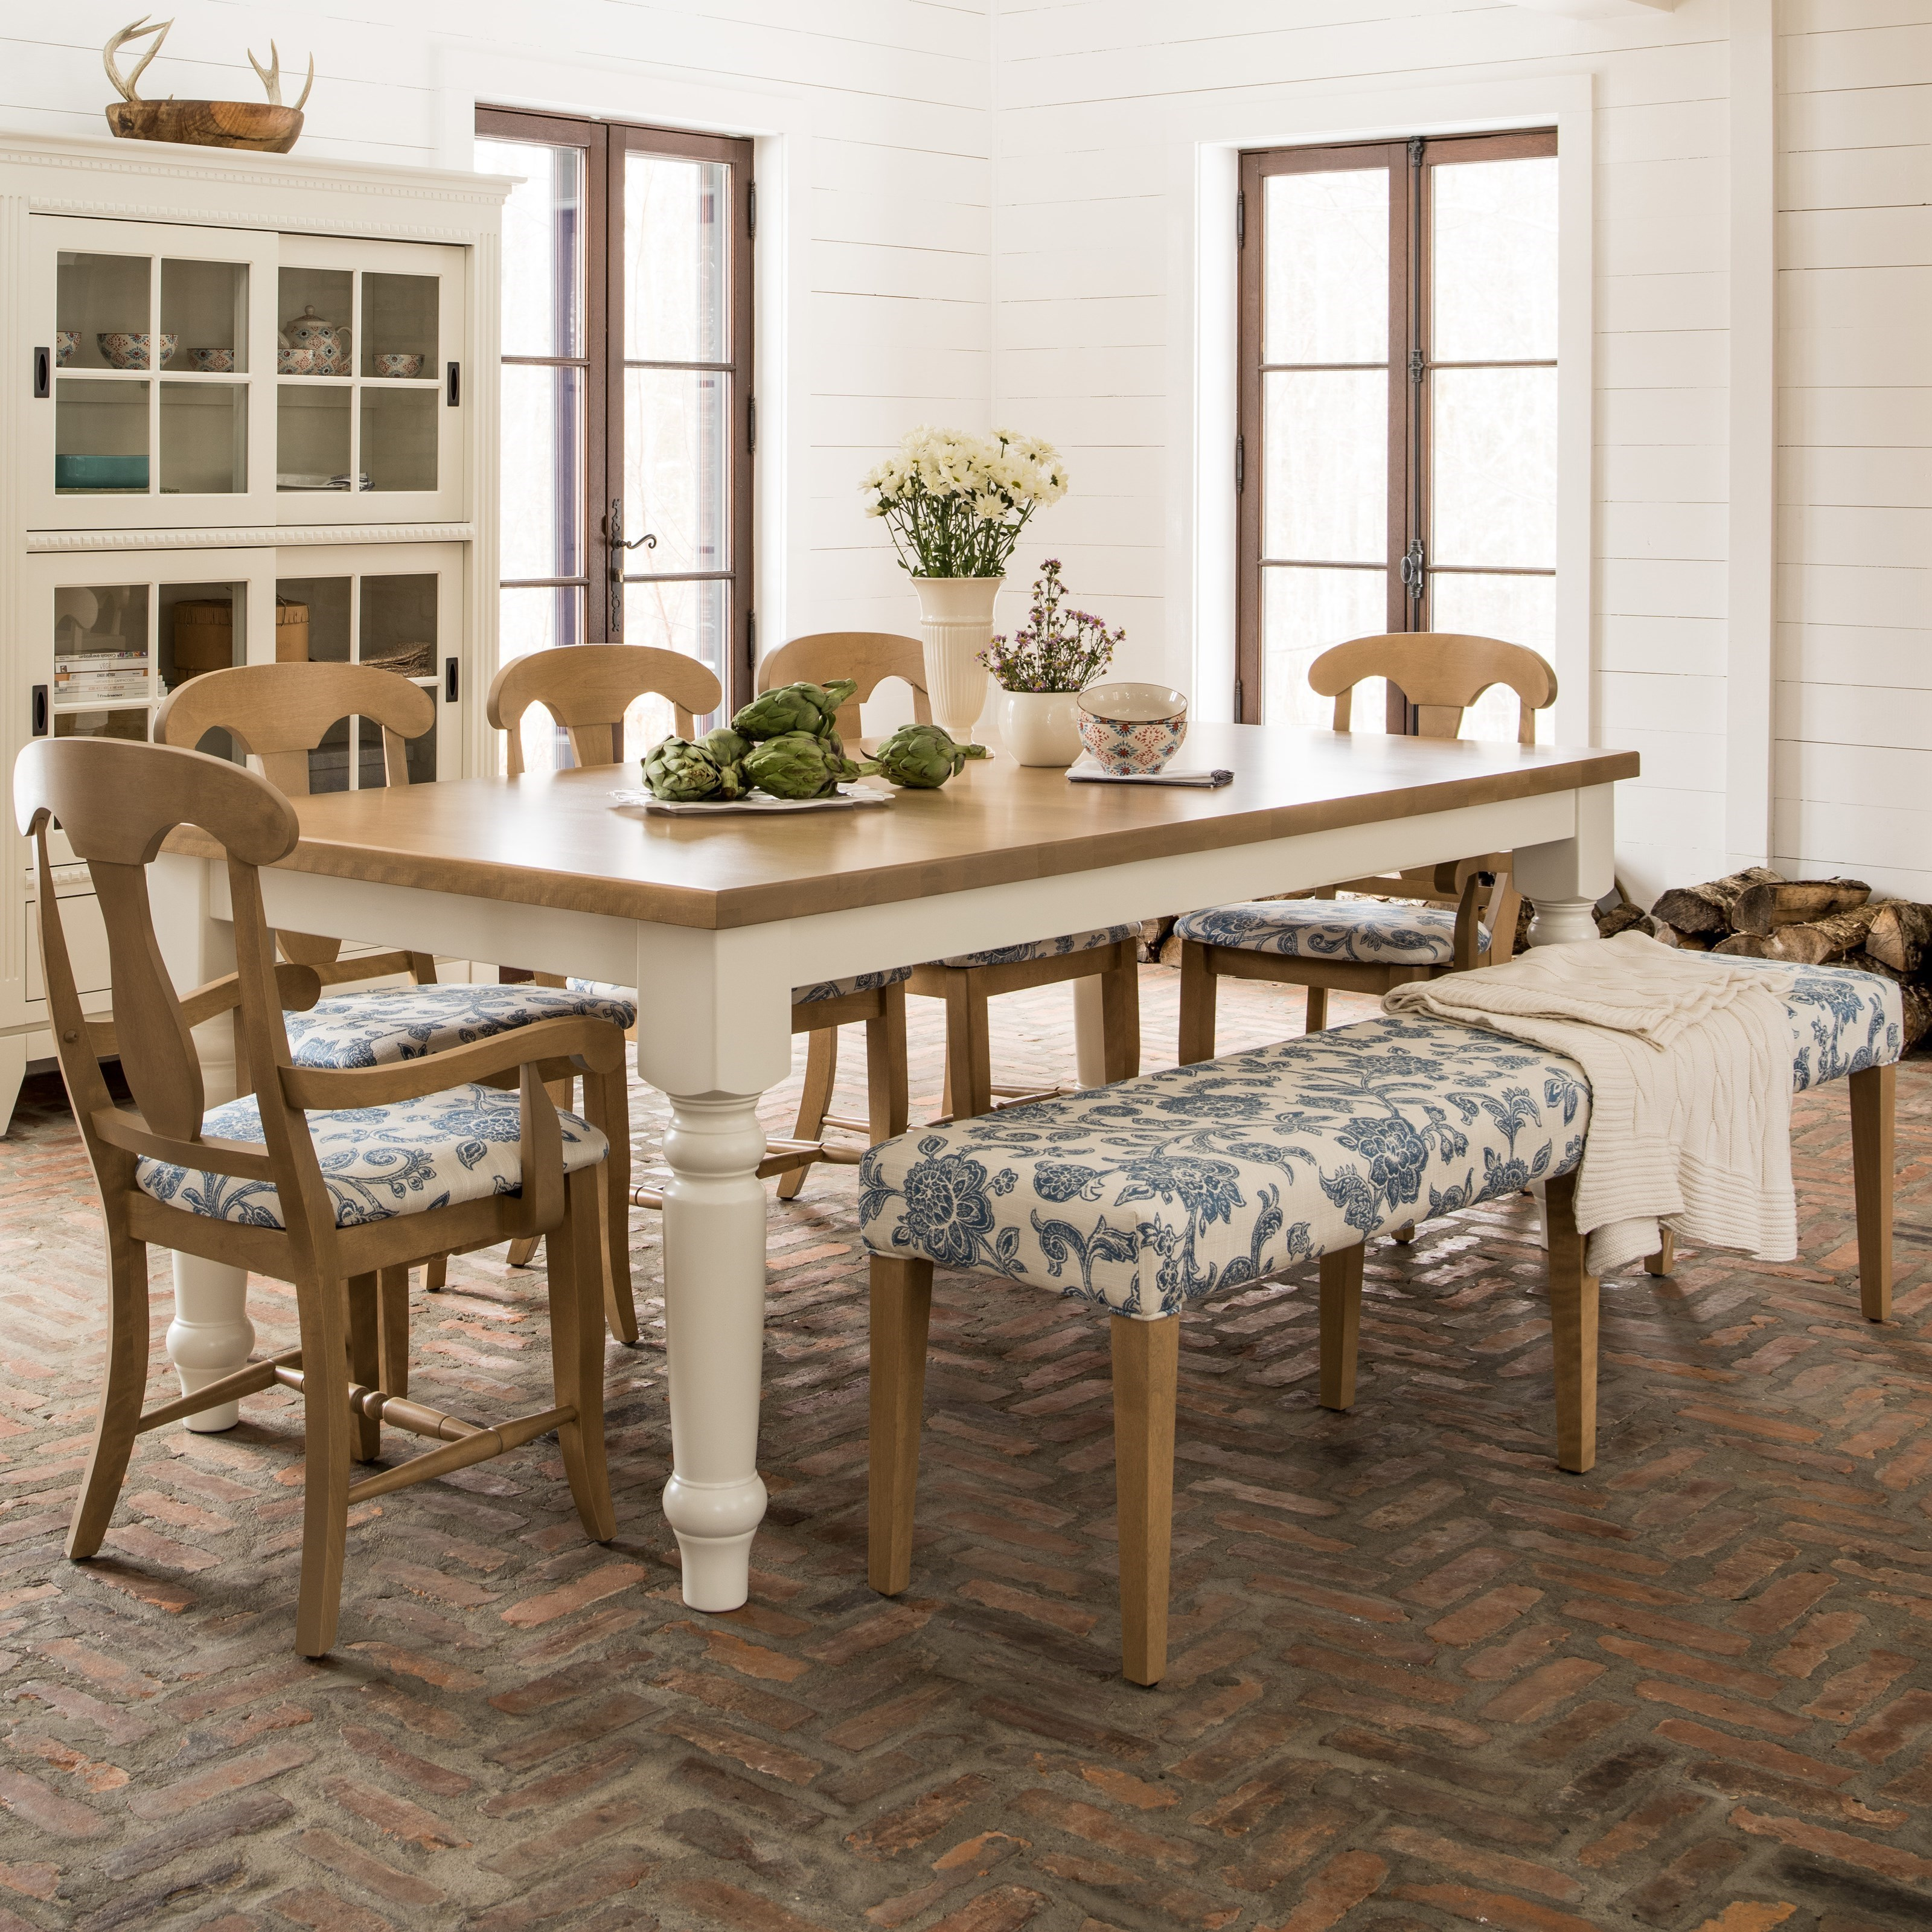 canadel custom dining customizable rectangular dining table set with rh johnvschultz com custom dining room seat cushions custom dining room table sets